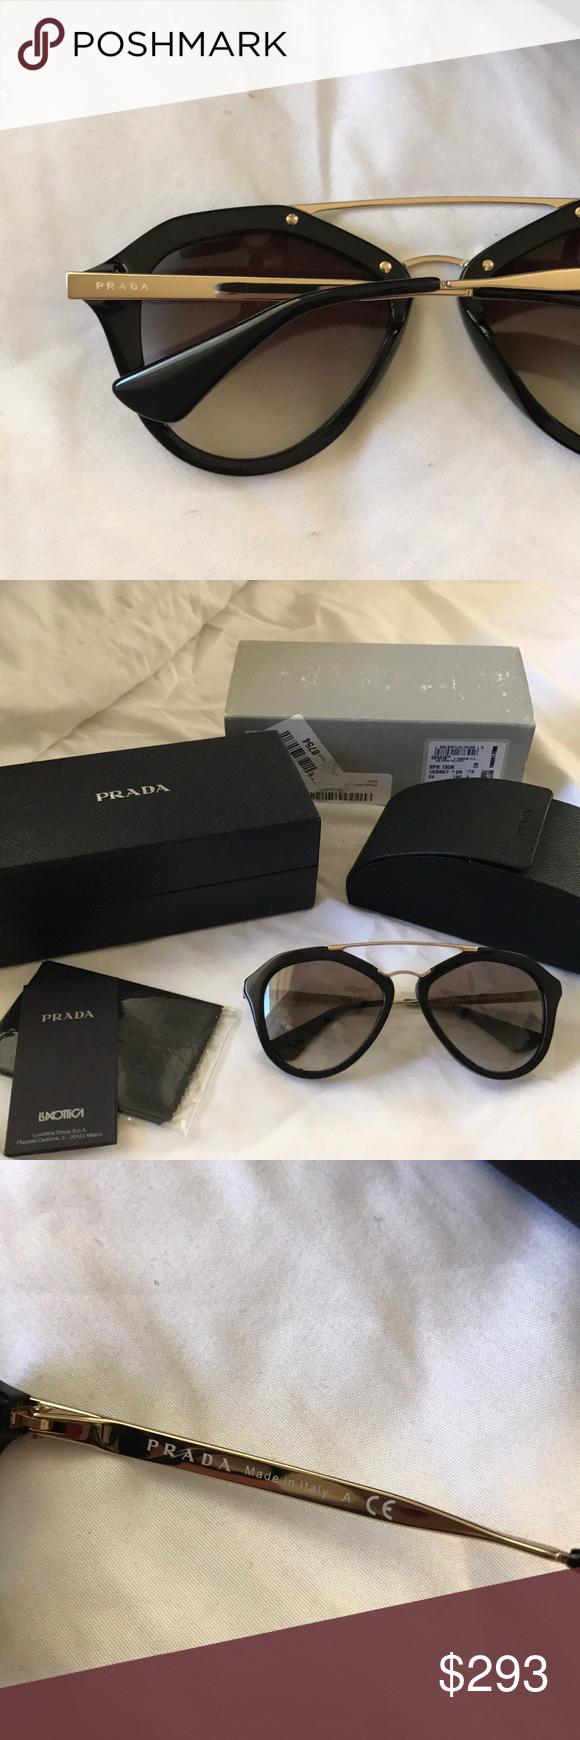 0a890147955 ... switzerland ib prada black aviator sunglasses brand new with all the  original paperwork and storage.